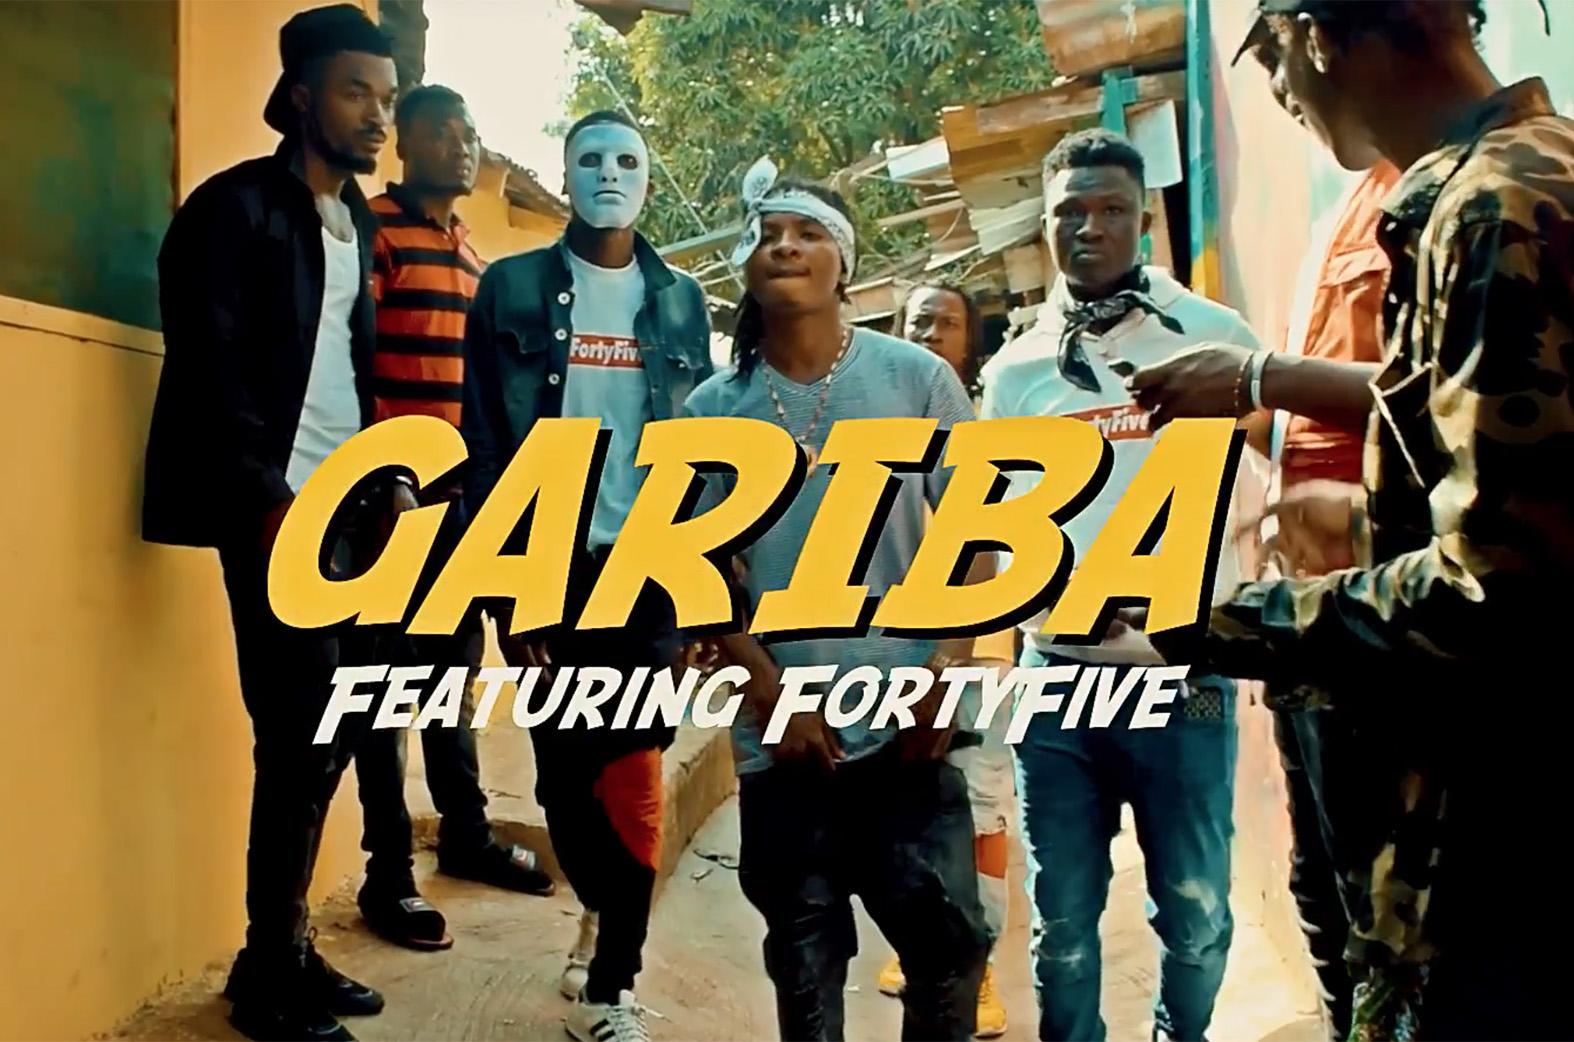 Wolf Gang by Gariba